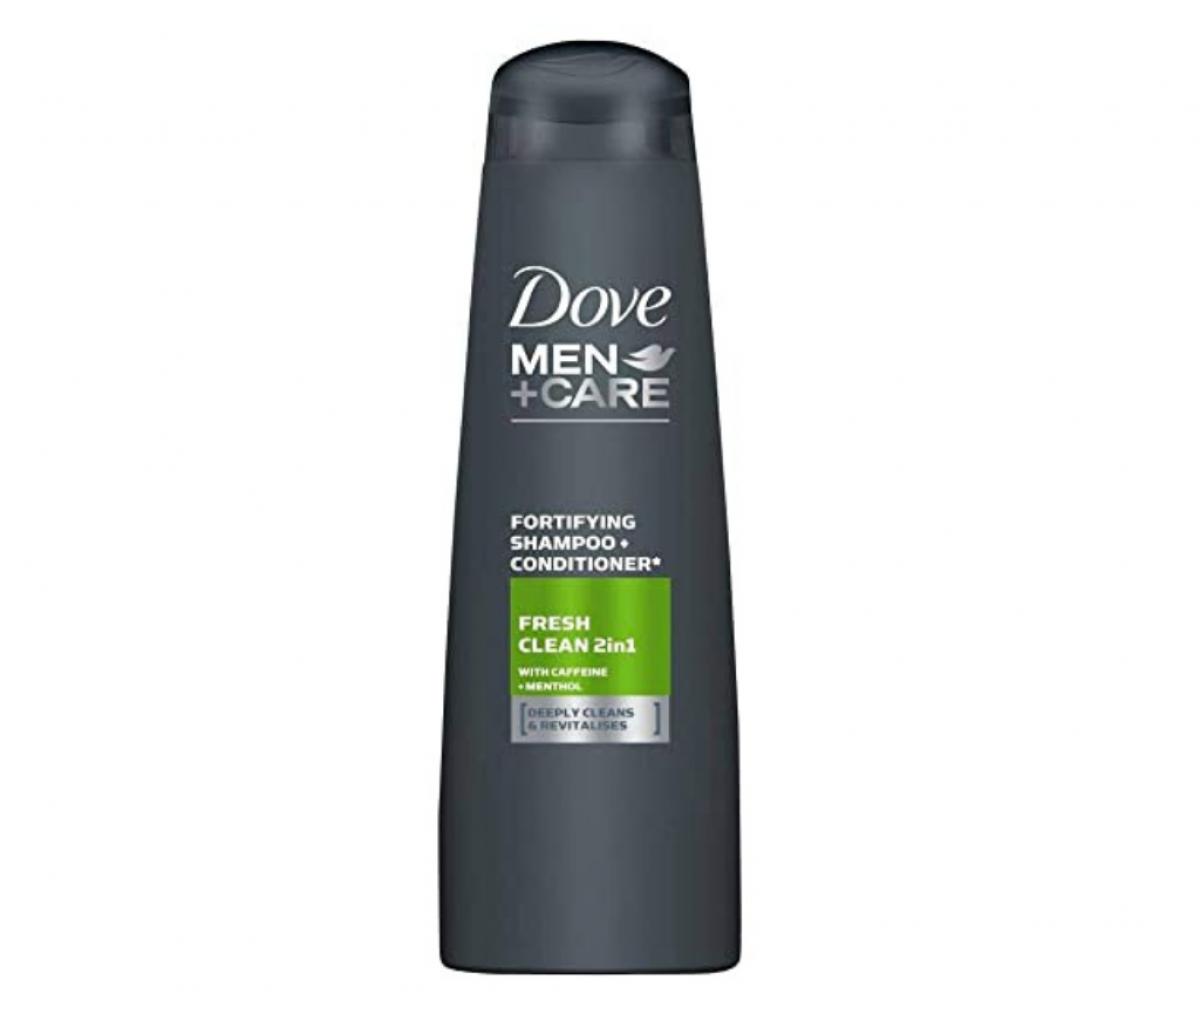 Dove 250ml 2in1 Fresh Clean Shampoo